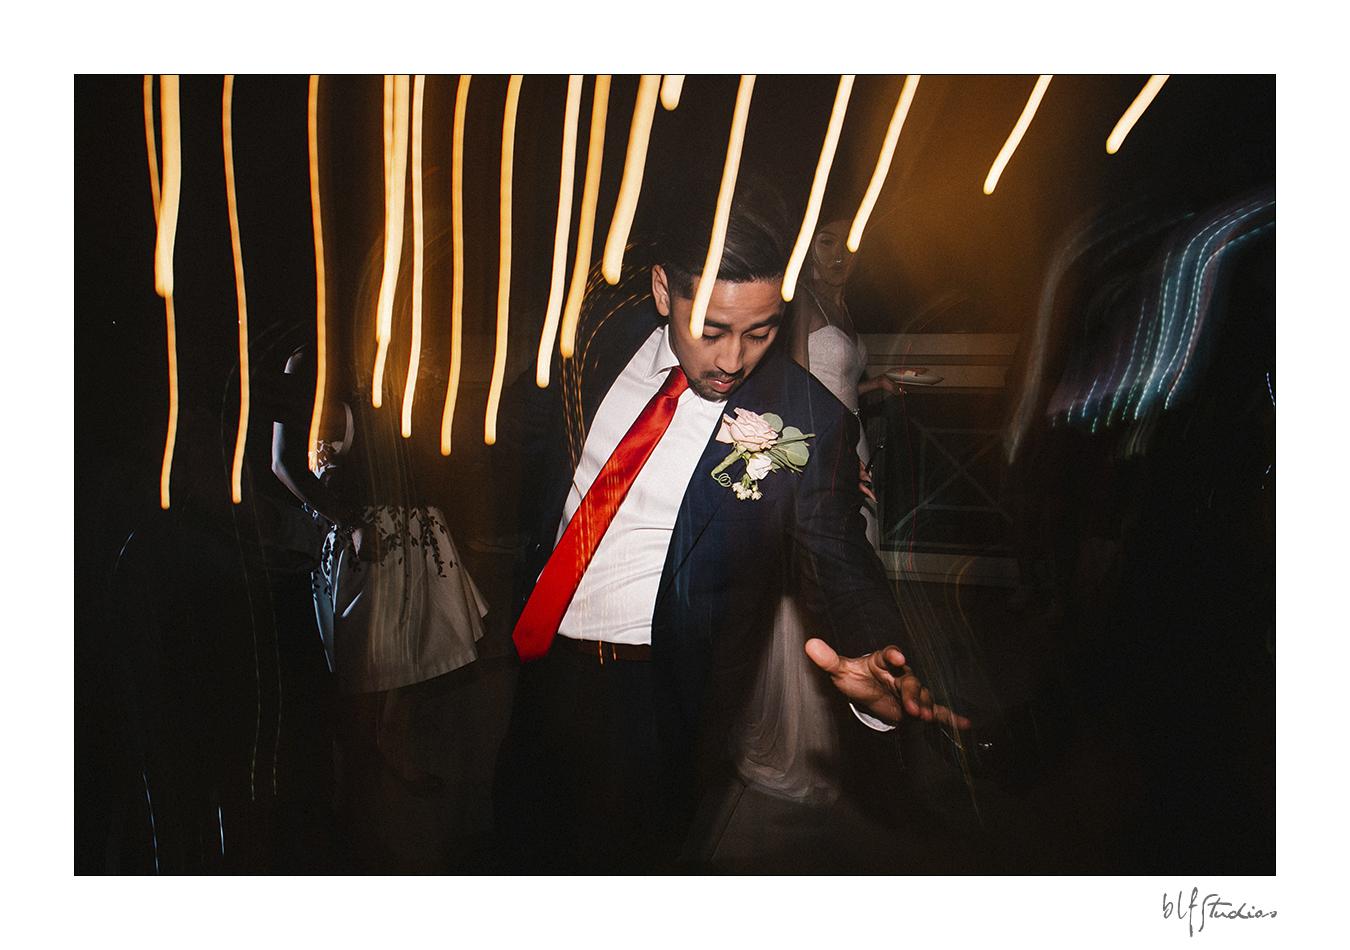 0049-blfstudios-wedding-photographer-daniel-danielle-atlanta.jpg